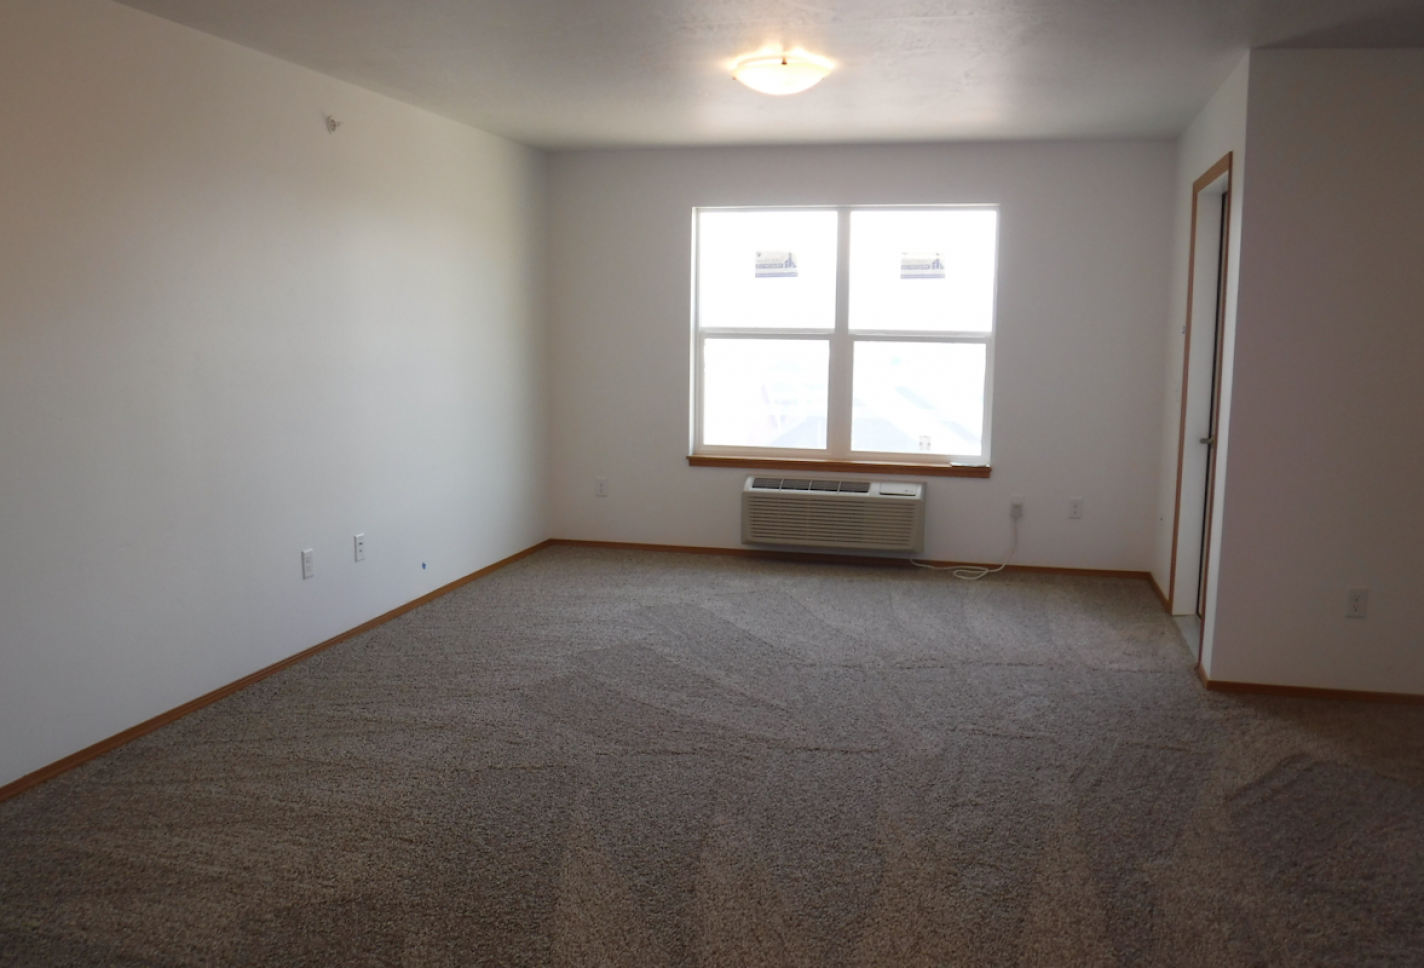 ppa-studio-living-room